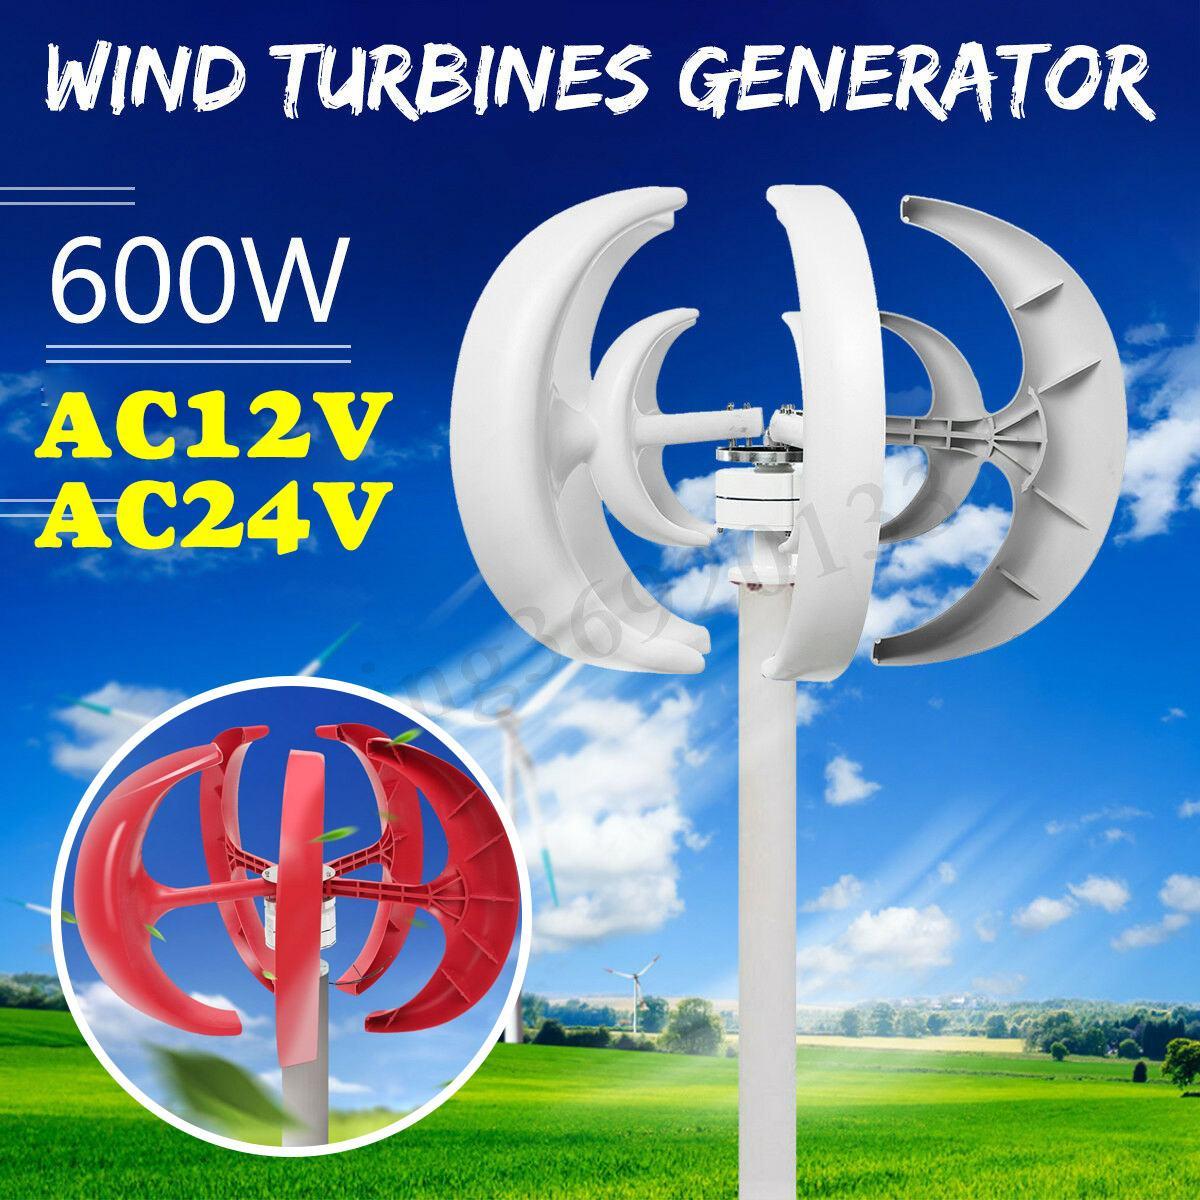 Max 600W 12V 24V VAWT 5  Vertical  Wind Turbines Generator  Lantern Type on AliExpress